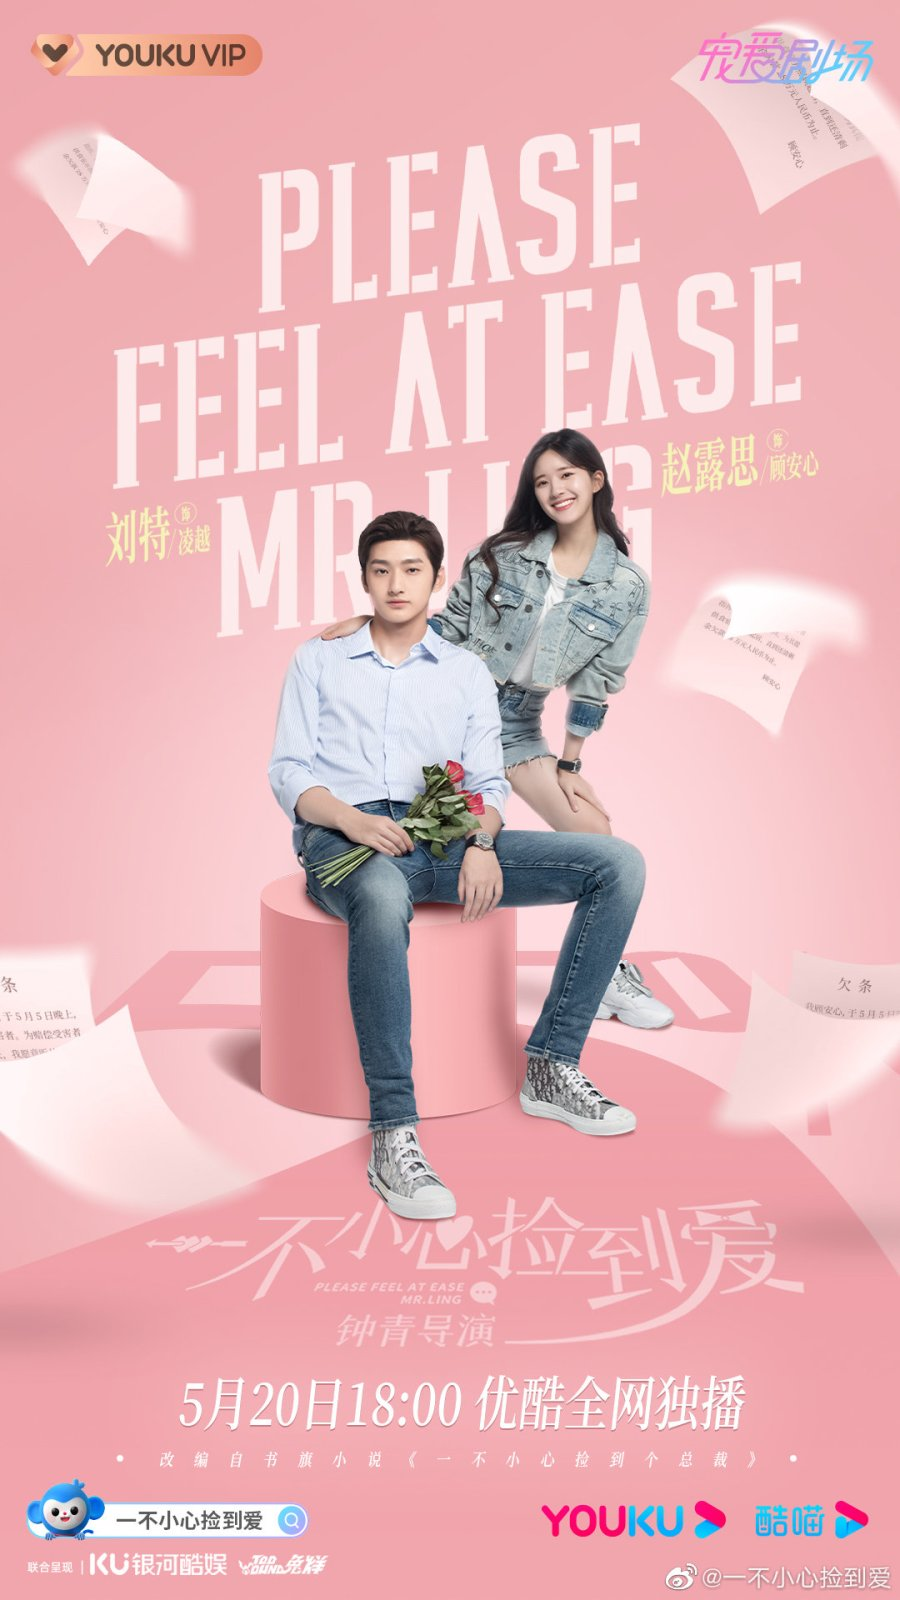 jNOPw 4f - Я случайно подобрала любовь ✦ 2021 ✦ Китай